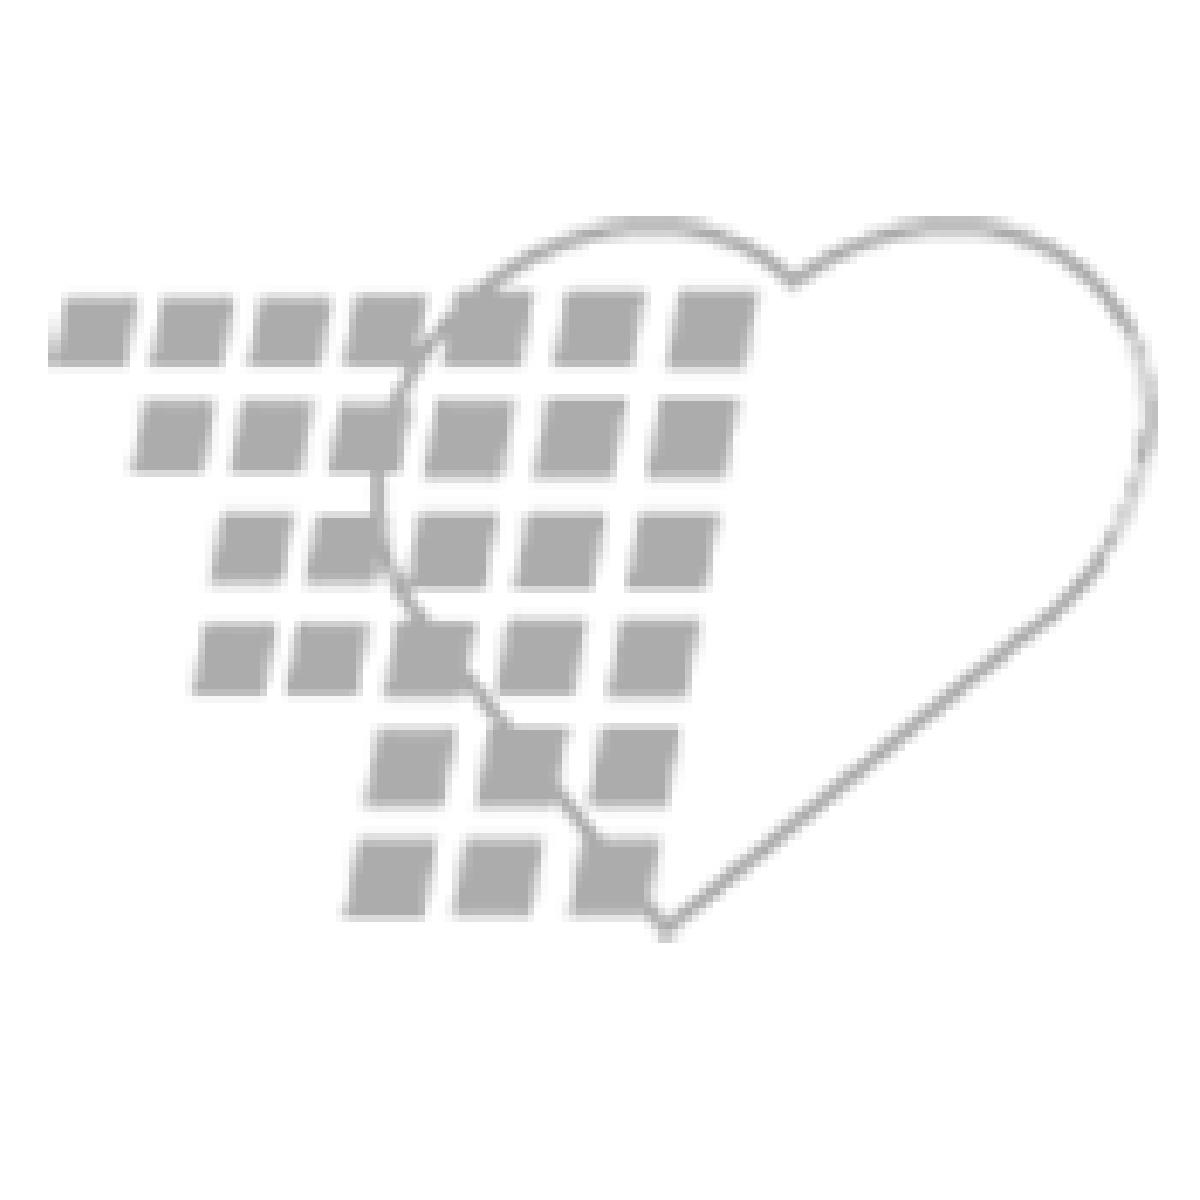 06-93-2011P Demo Dose® Clear Ampule